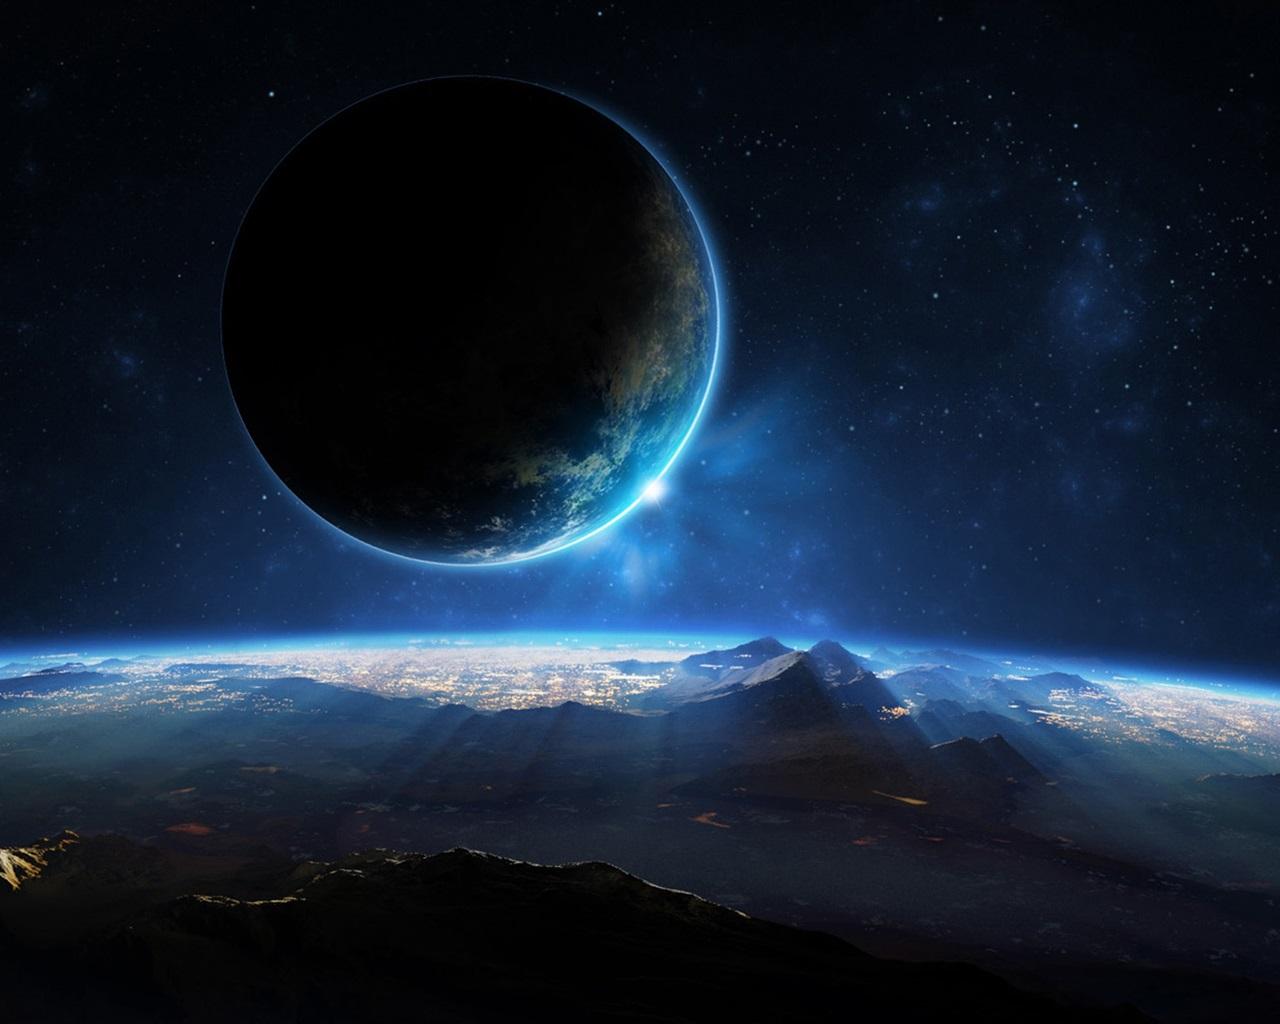 惑星、宇宙、科学Fiの、光、山 壁紙 - 128... 惑星、宇宙、科学Fiの、光、山 壁紙 |